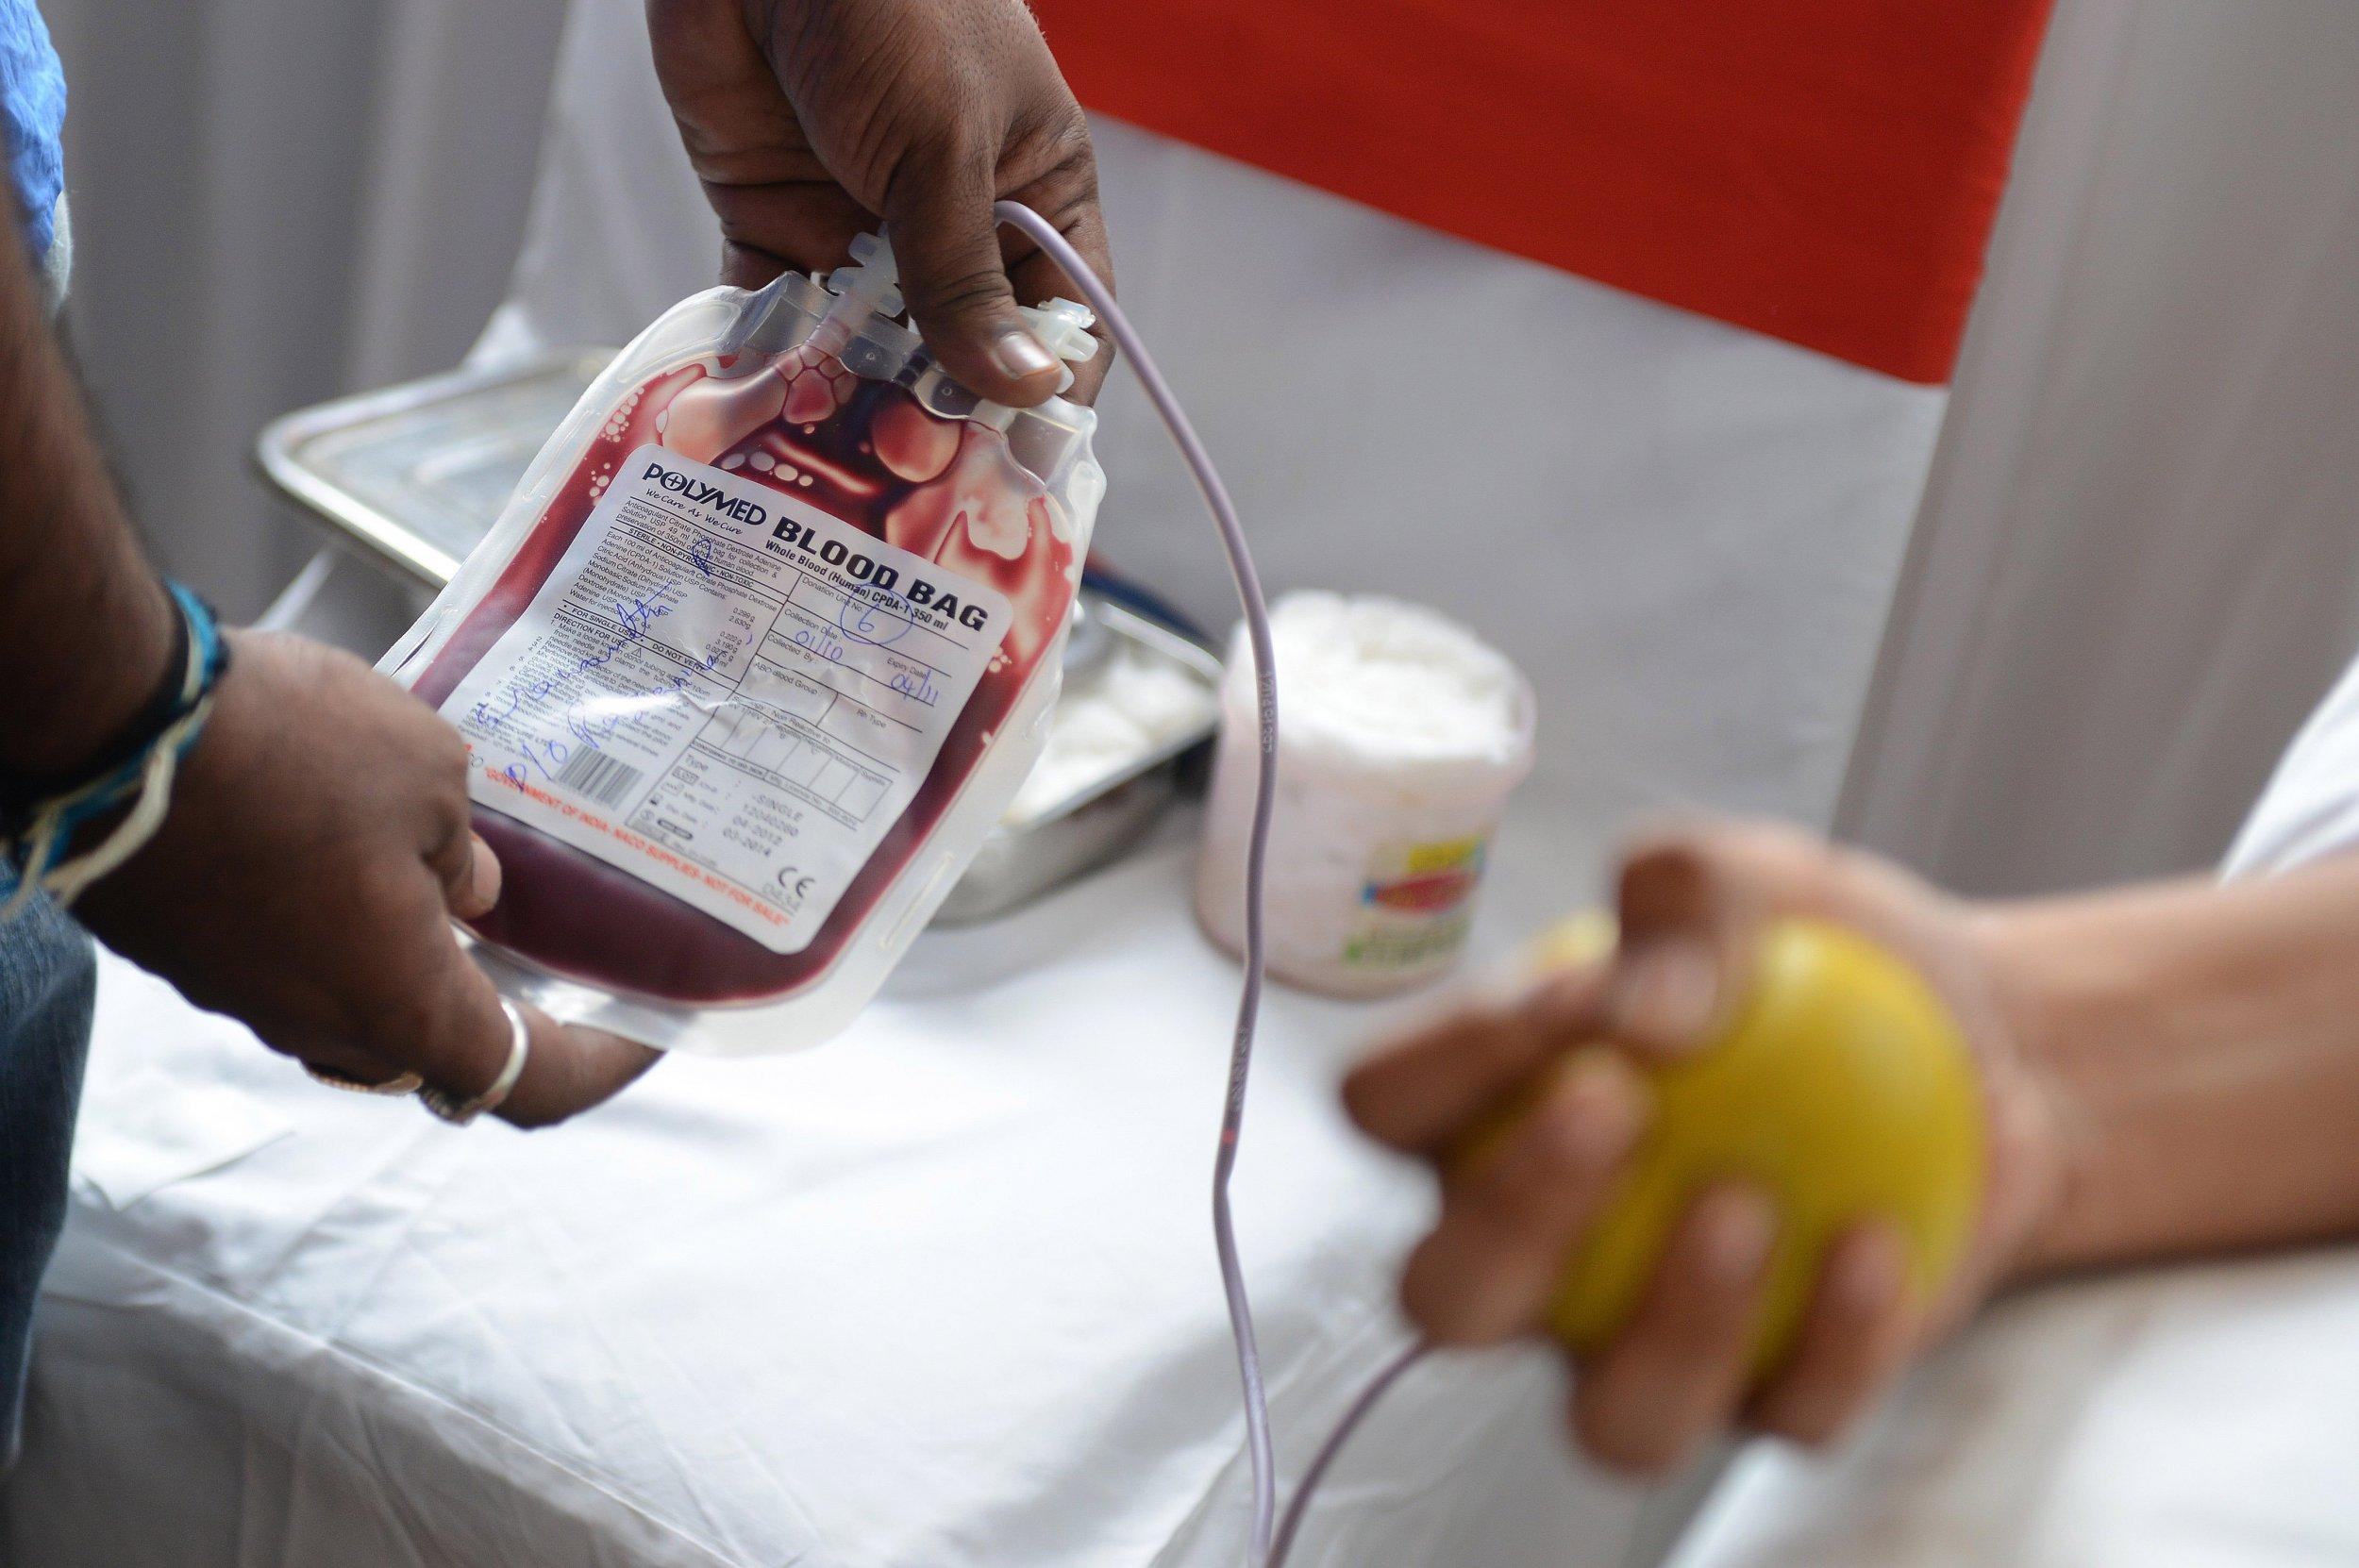 5_2_Blood bag